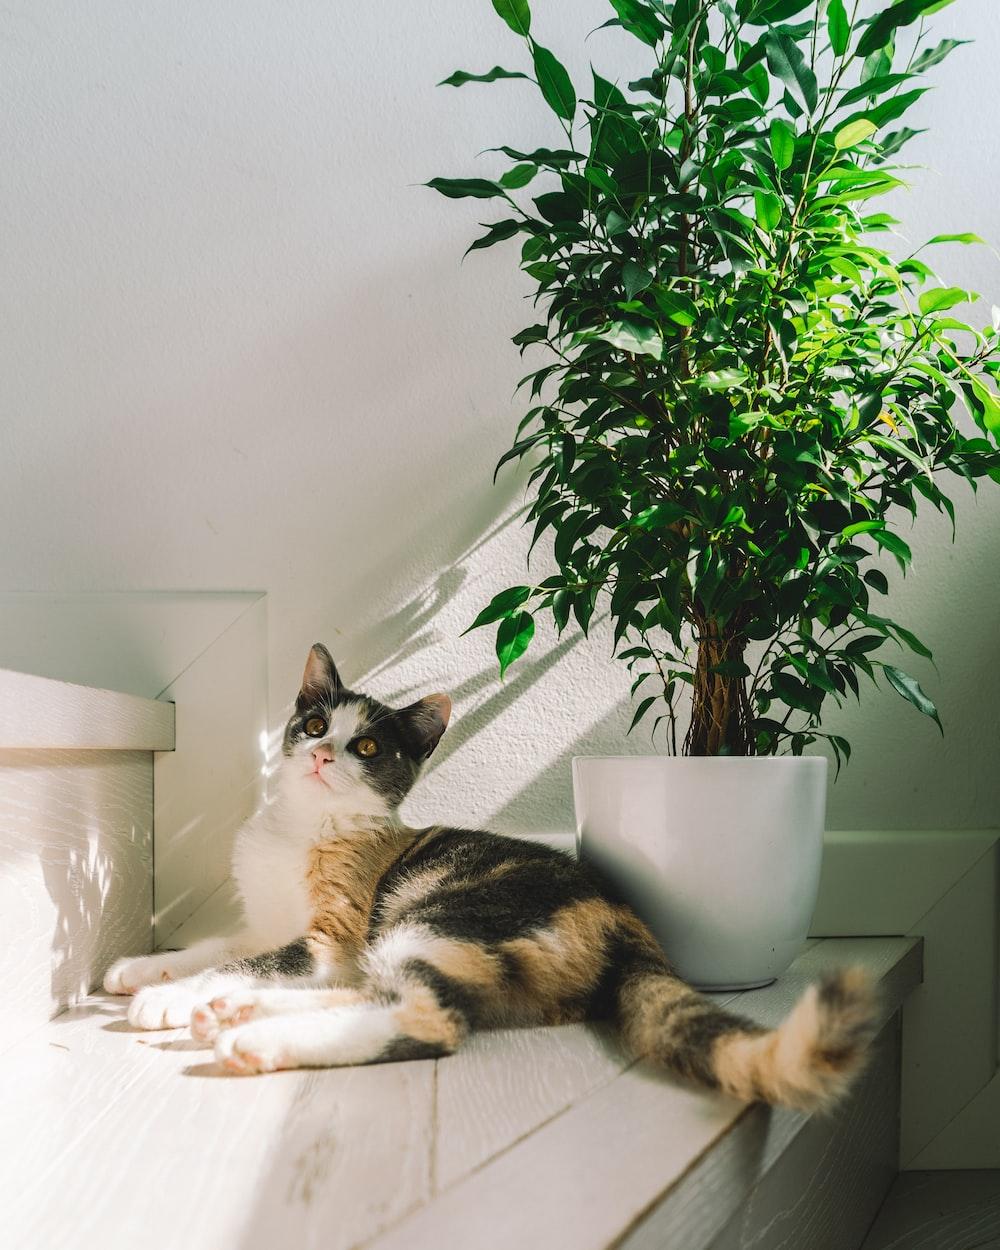 cat lying beside plant in plant pot